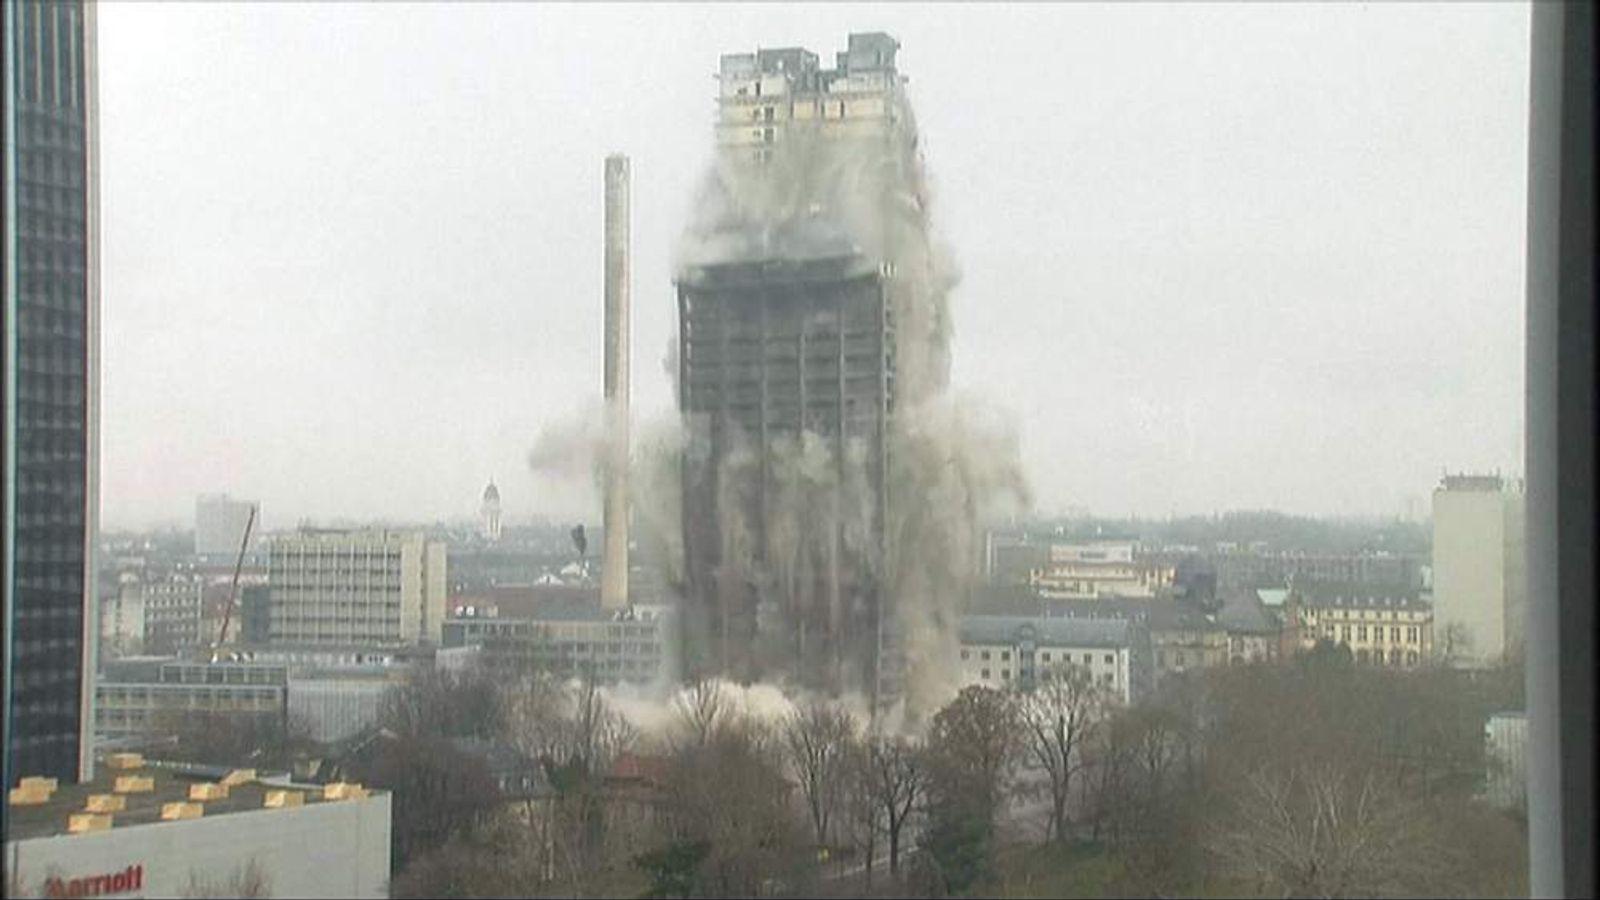 Building demolished in Frankfurt